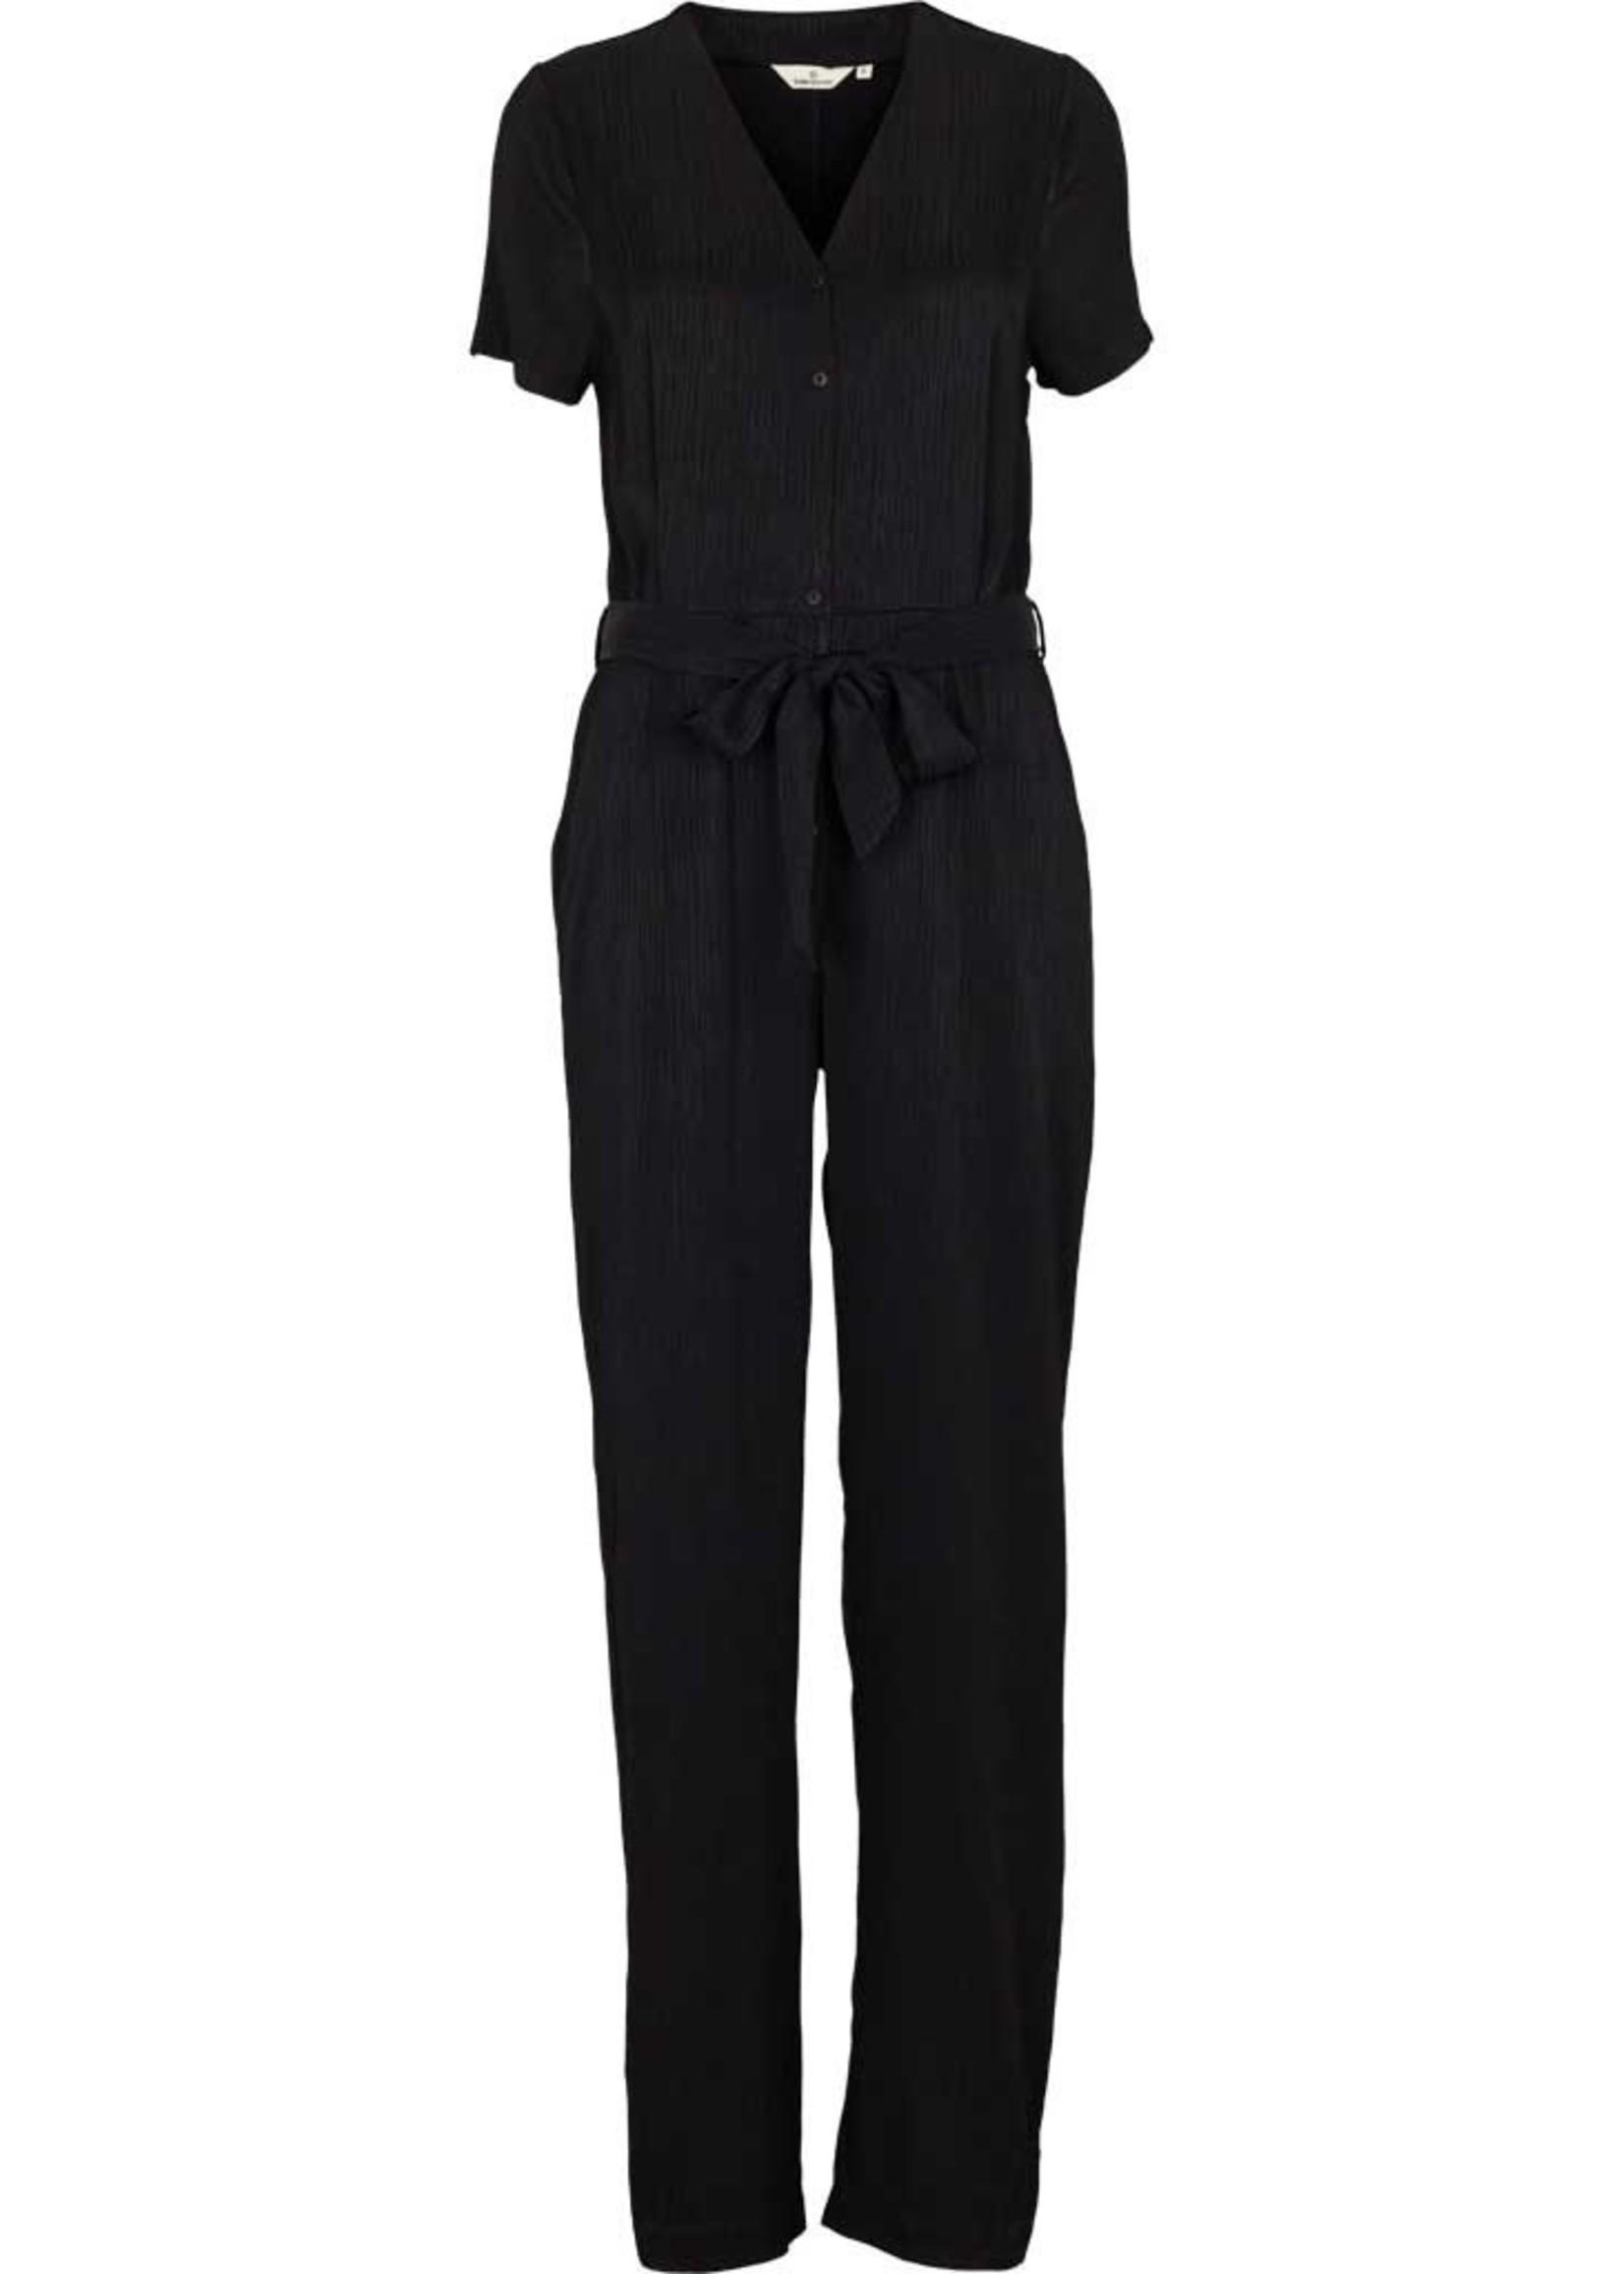 Basic Apparel Keira Jumpsuit